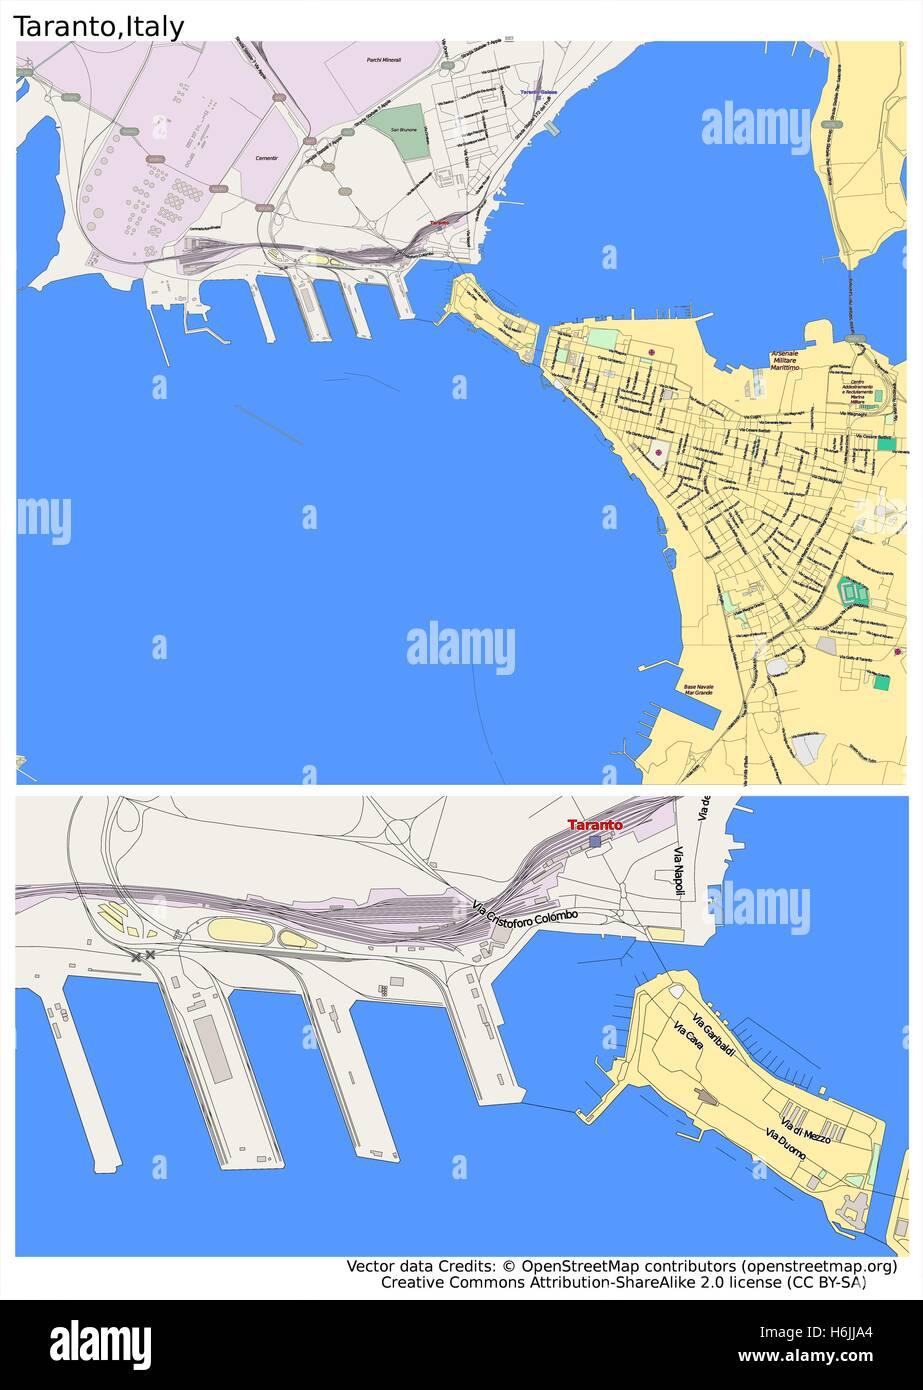 Taranto Italy city map Stock Vector Art Illustration Vector Image